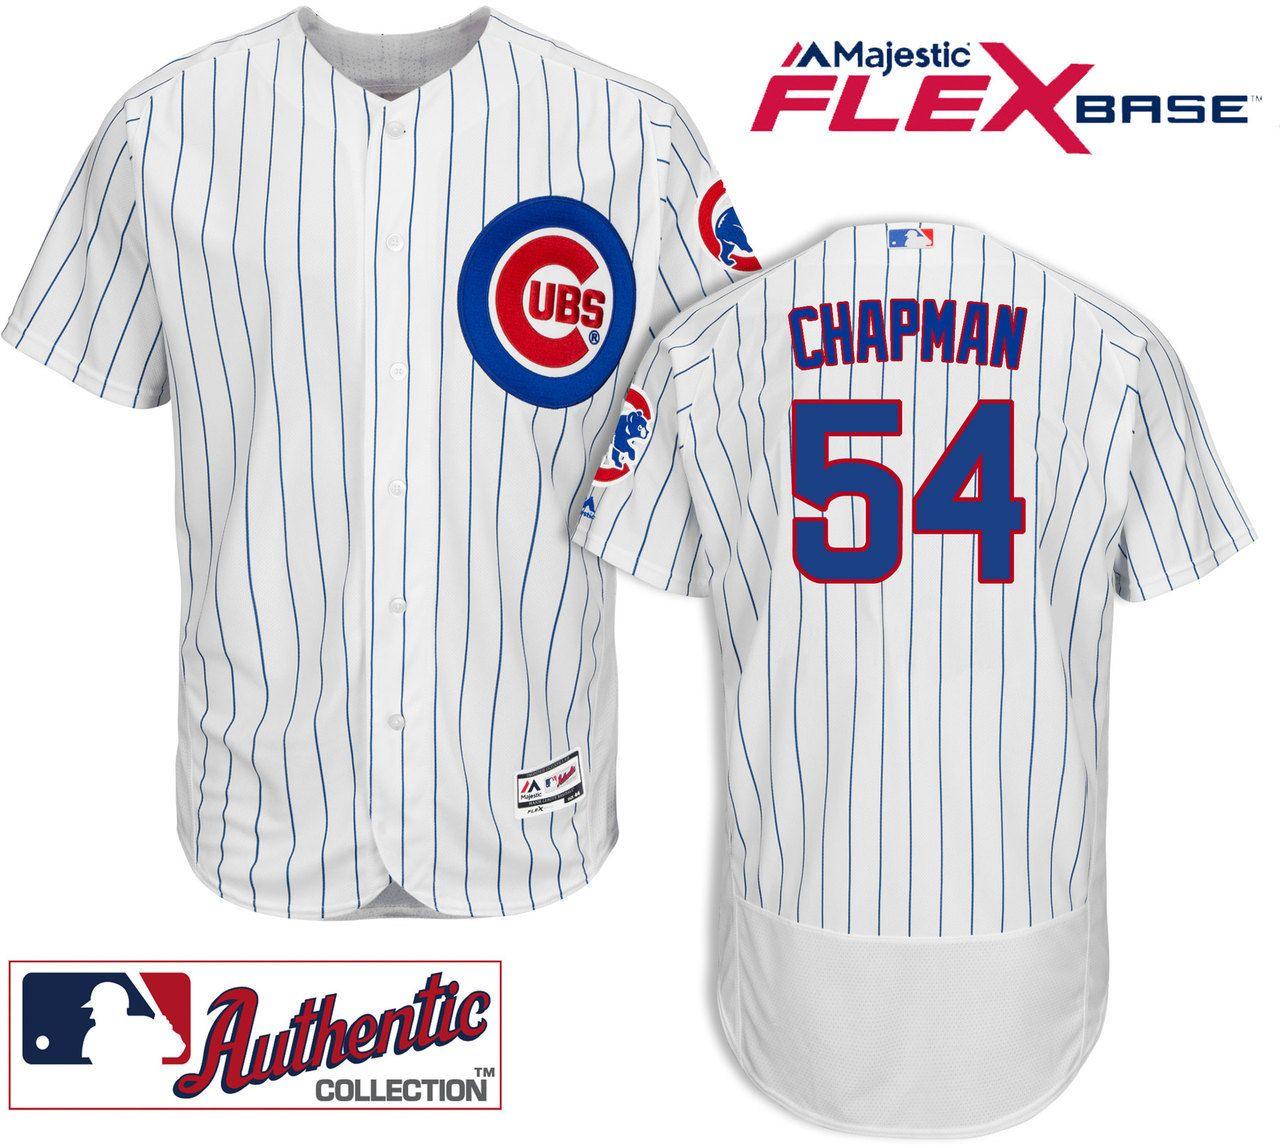 timeless design e84ec 79d08 Aroldis Chapman Chicago Cubs Home Authentic Flexbase Jersey ...